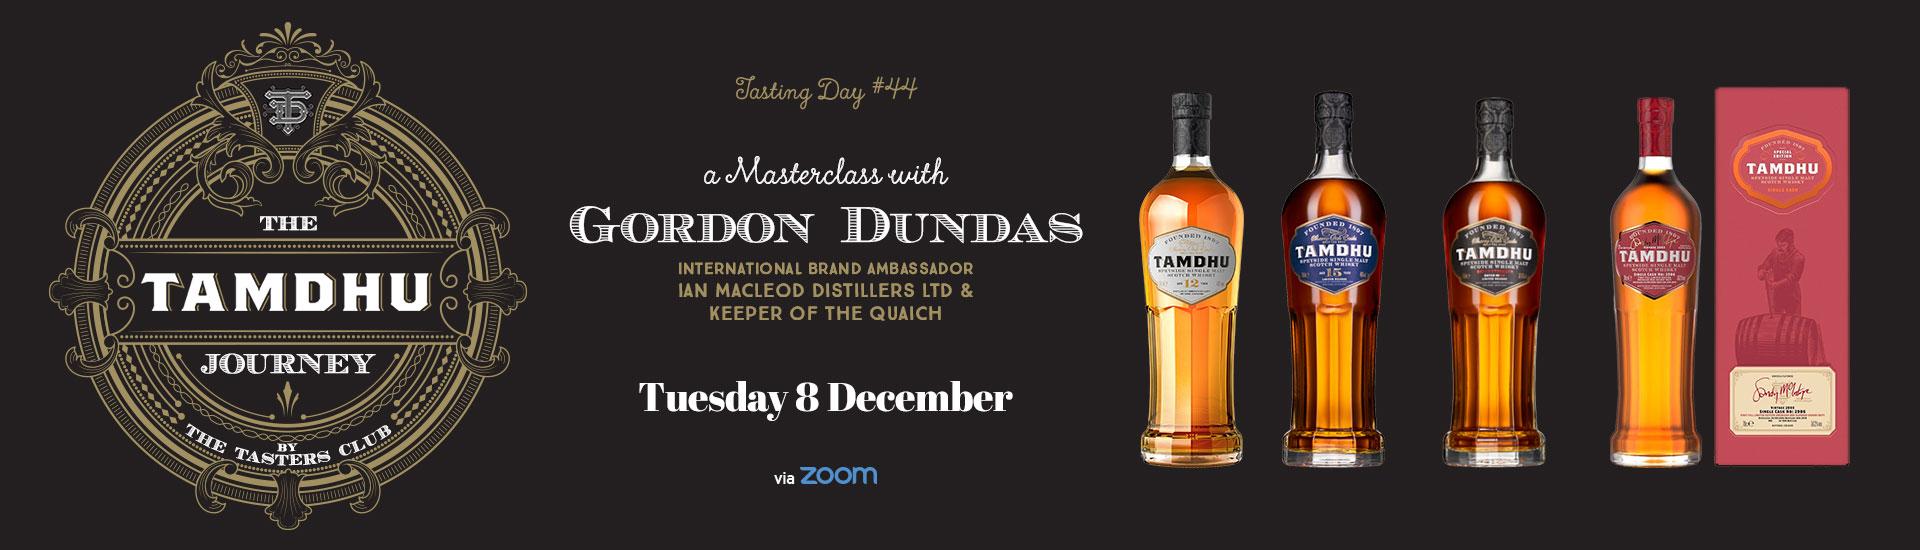 The Tasters Club Tasting Day 44 Tamdhu whisky tasting Gordon Dundas masterclass